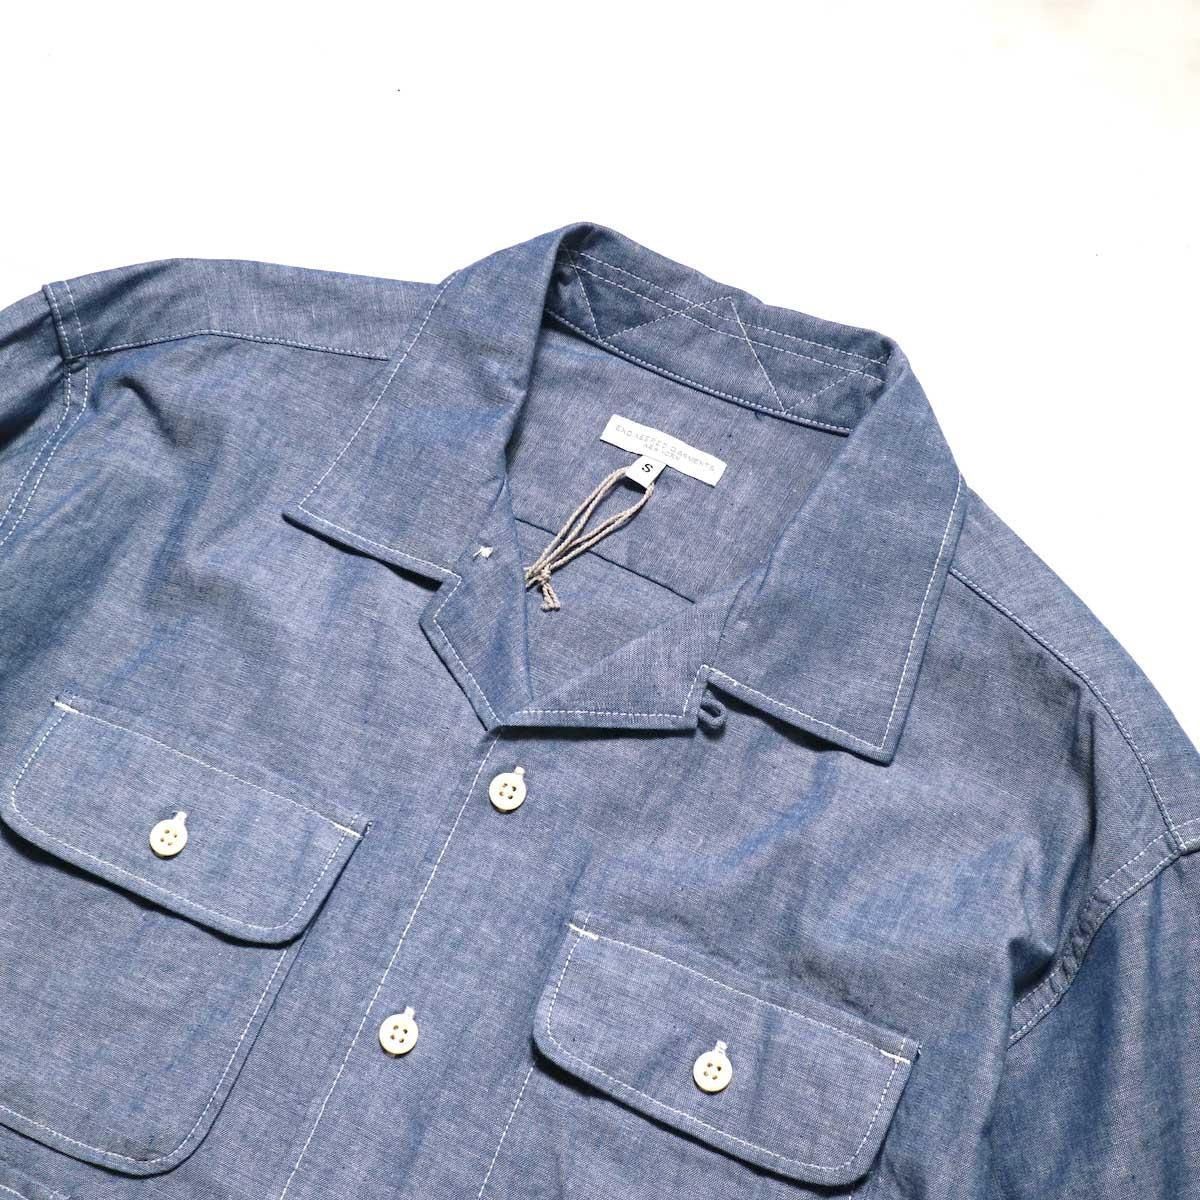 Engineered Garments / Bowling Shirt-Cotton Chambray (Blue)襟